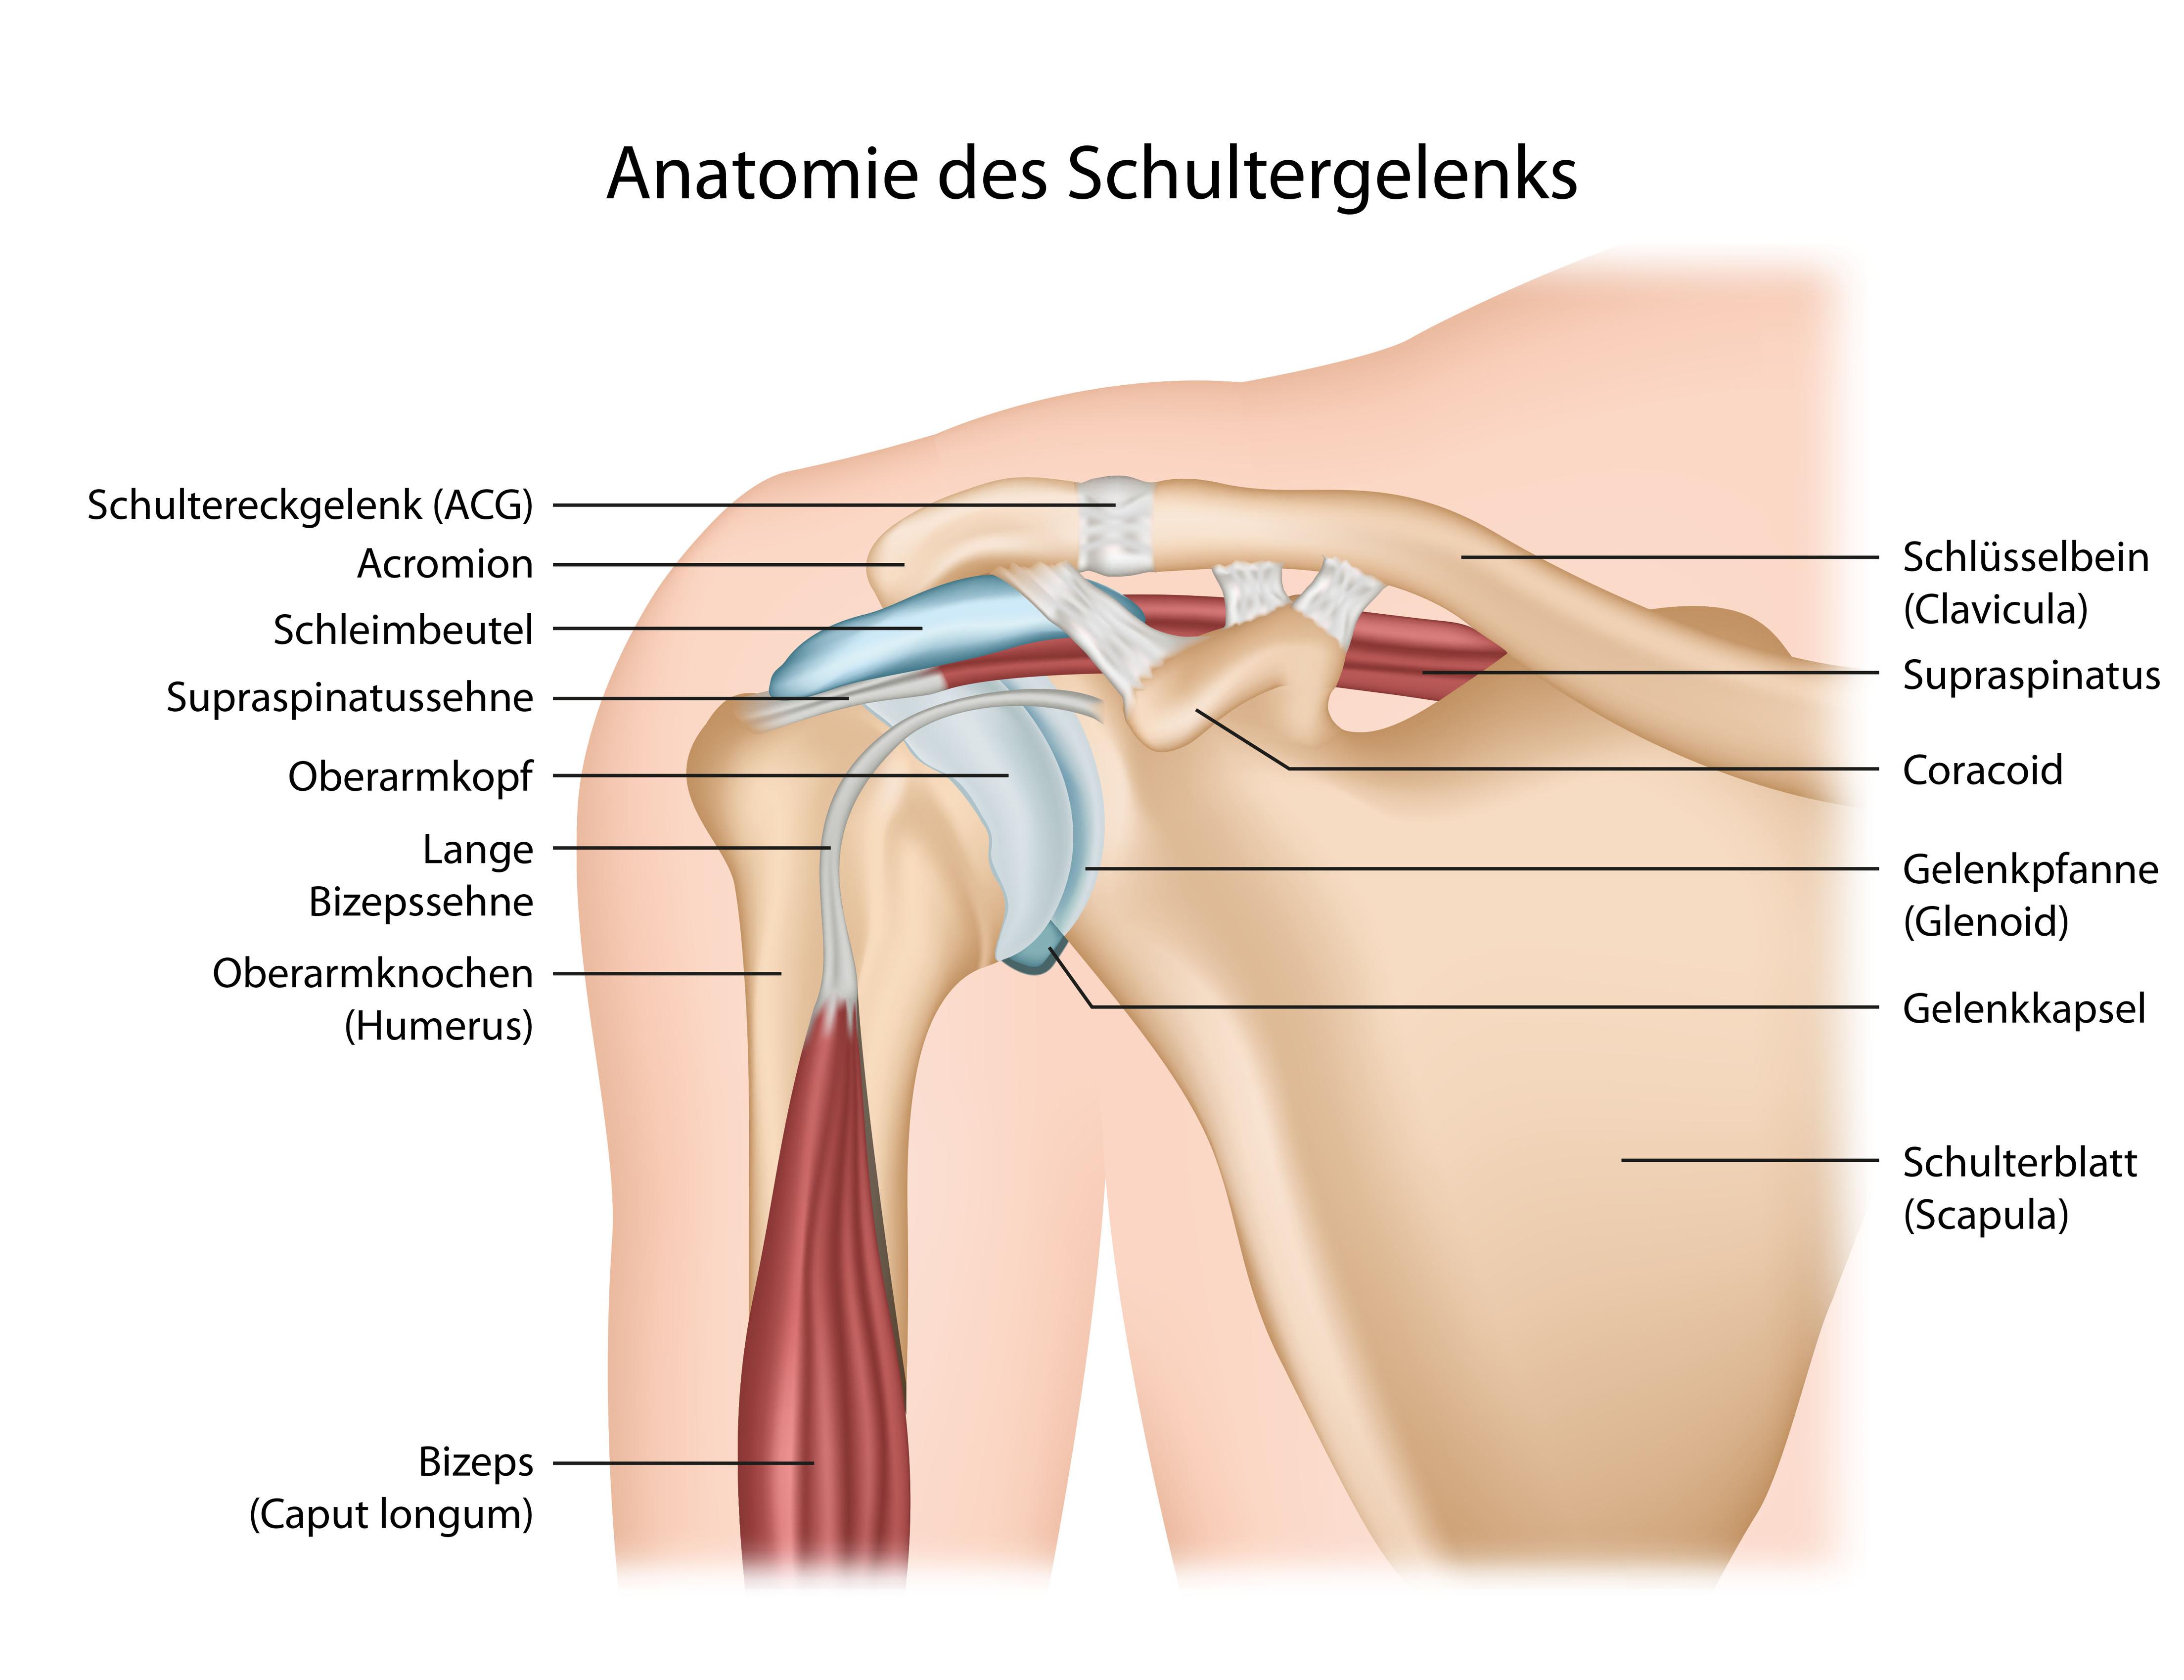 Schulterknacken; Knacken in der Schulter